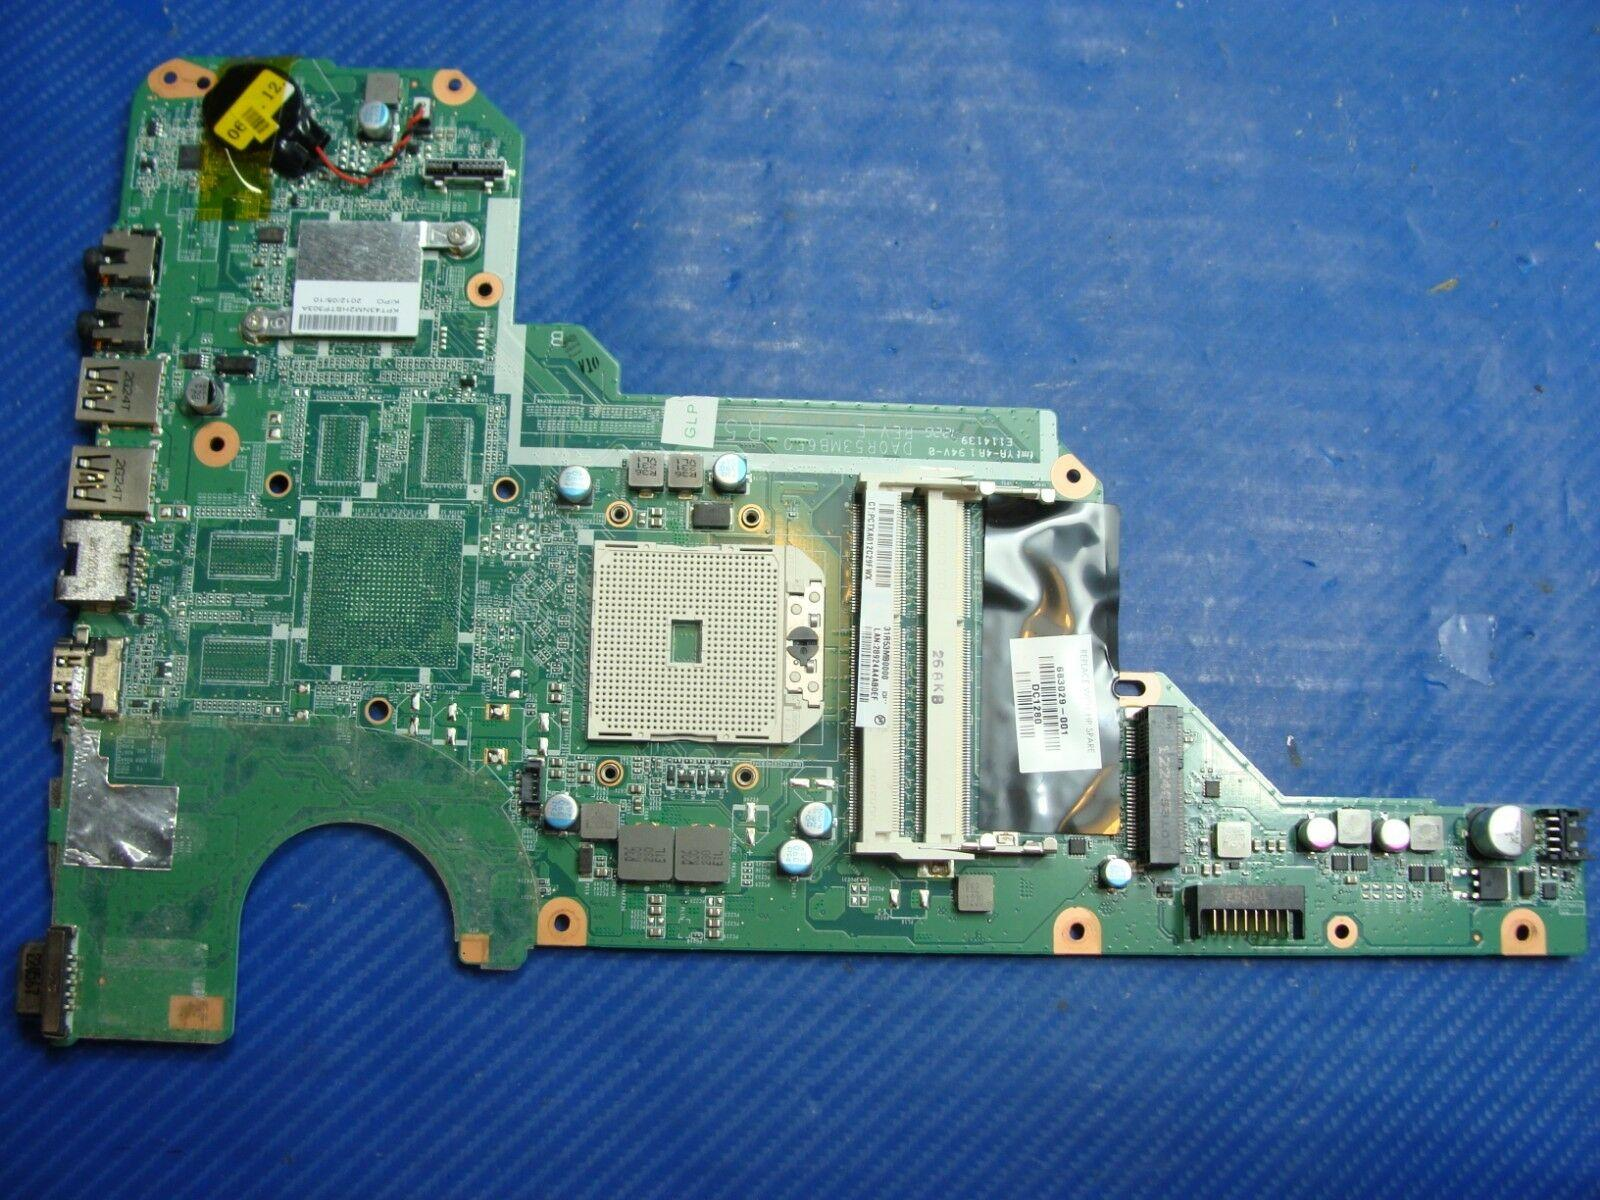 683029-501 683029-001 Mainboard for HP Pavilion G4-2000 G6 G6-2000 G7 Laptop Motherboard DA0R53MB6E0 DA0R53MB6E1 full test 100%